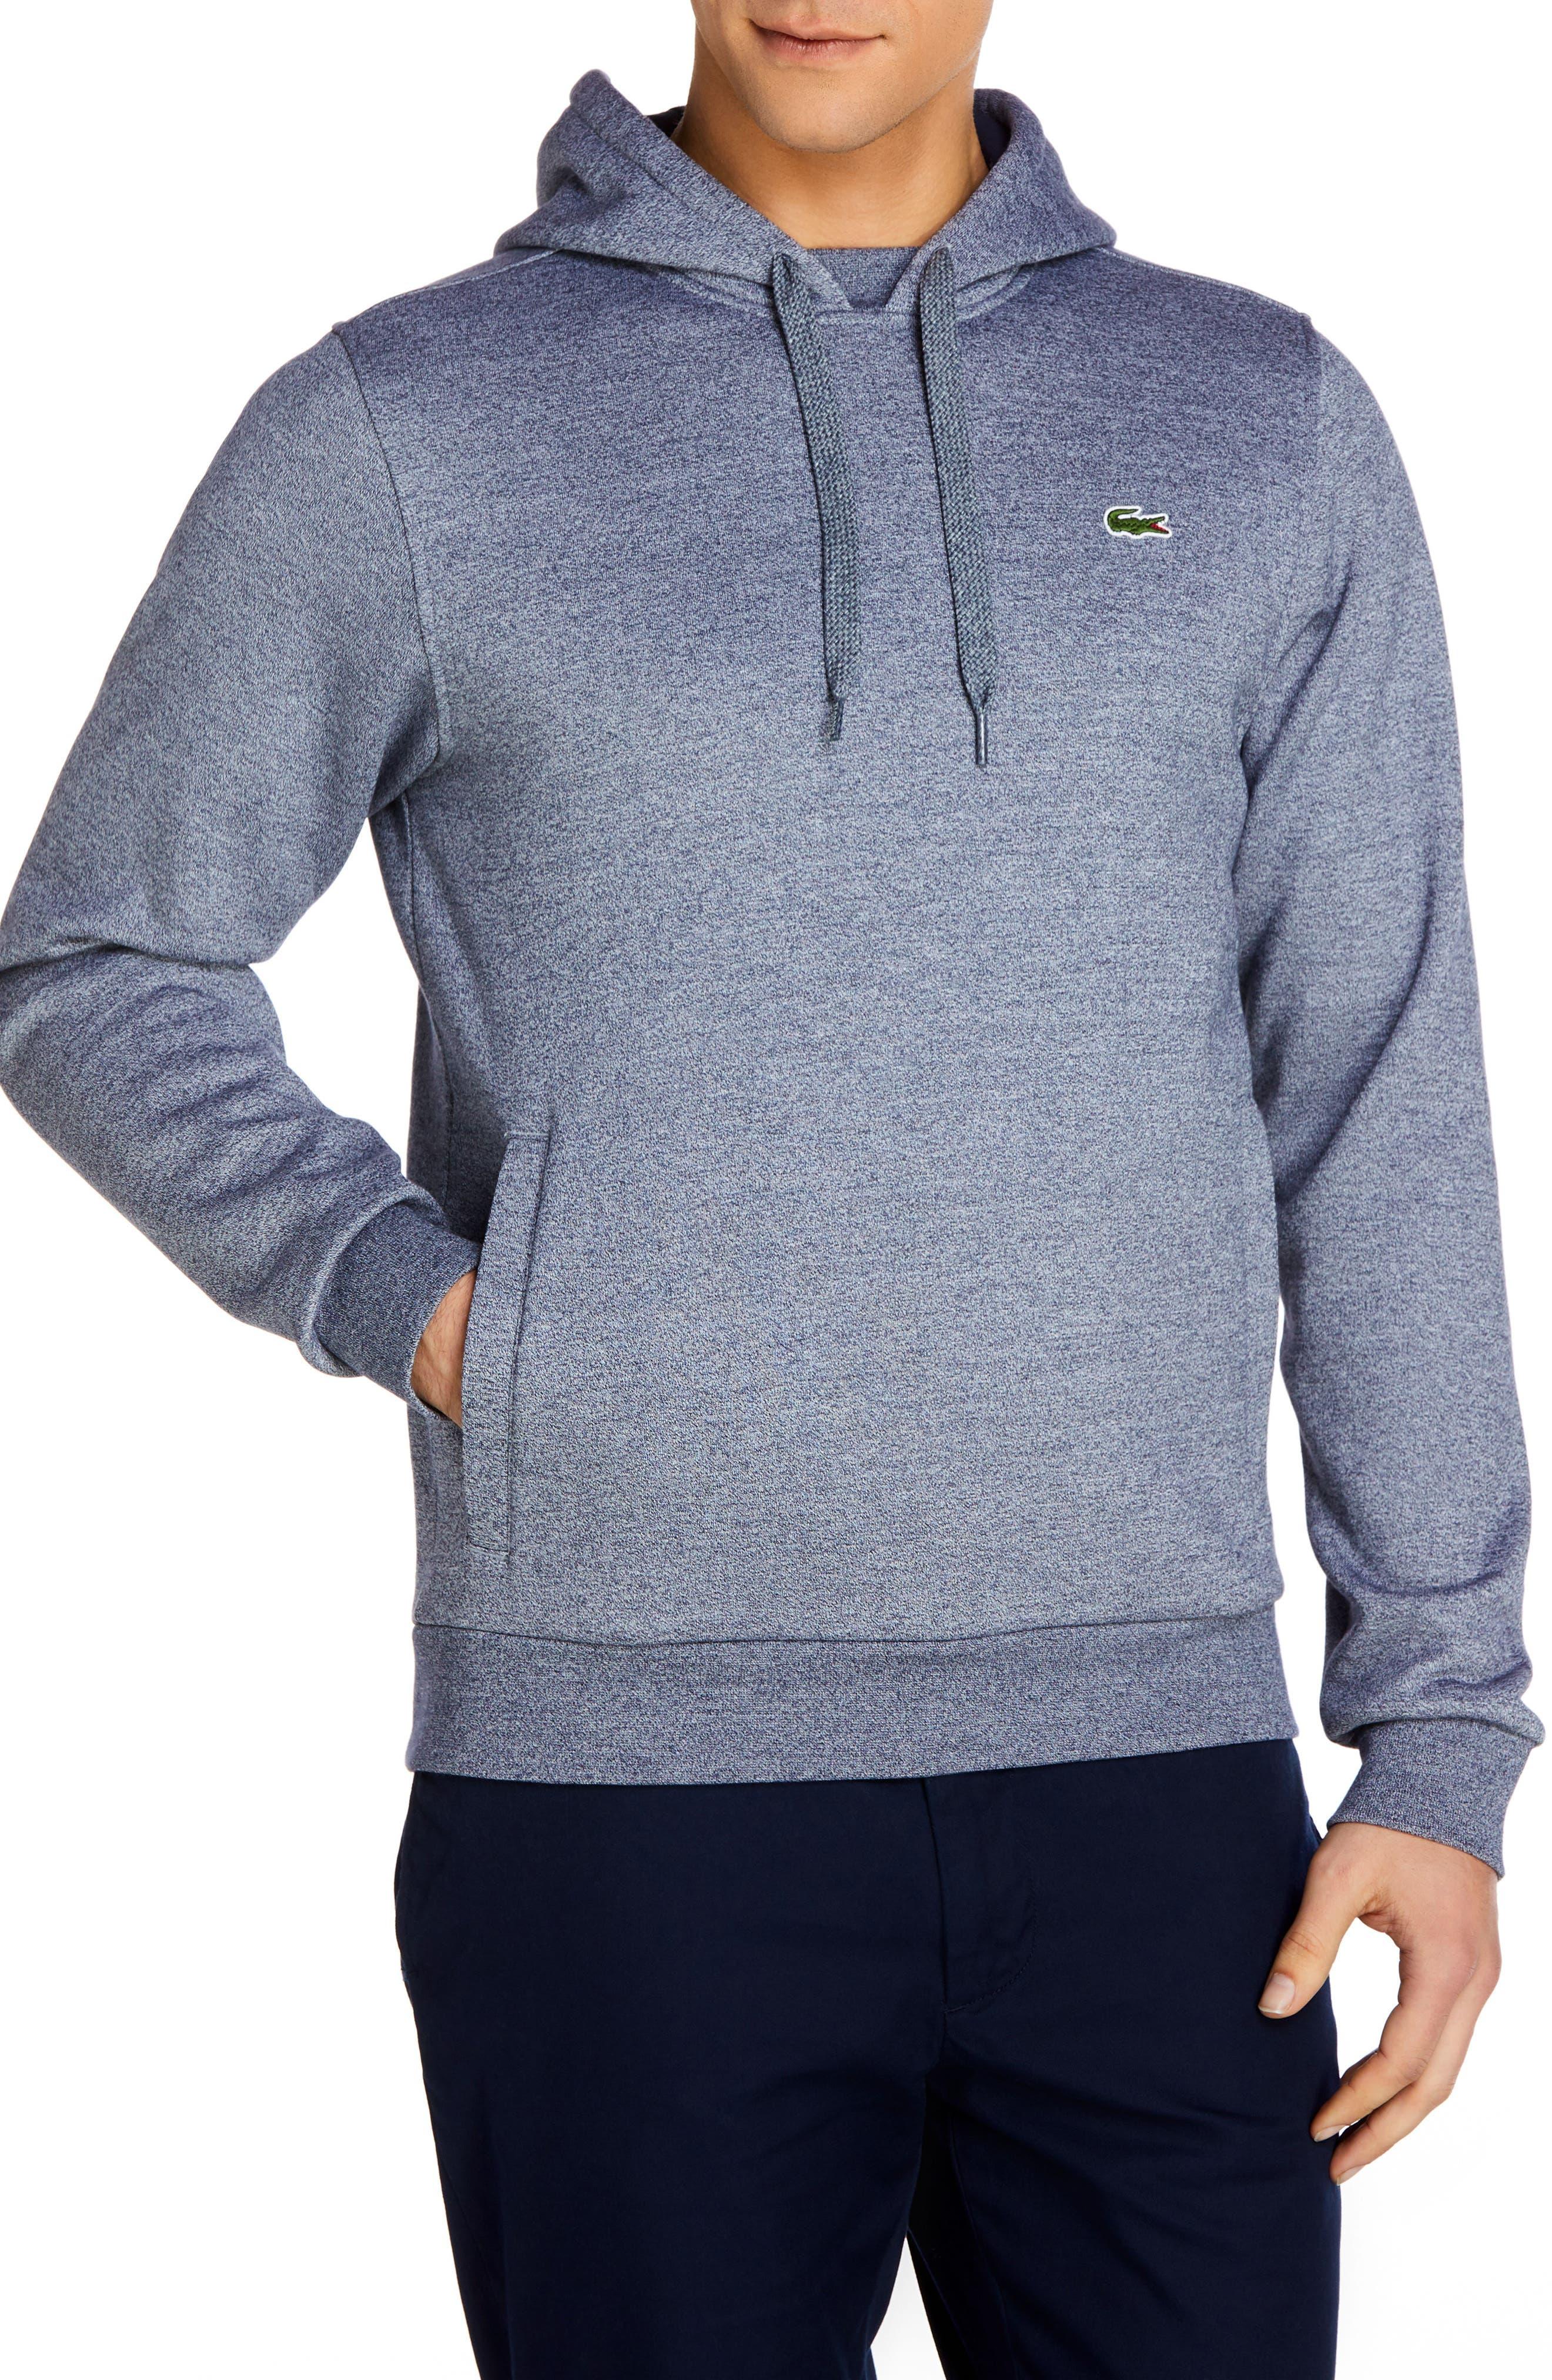 Sport Cotton Blend Hoodie,                         Main,                         color, Tvk Mouline Navy Blue/ Navy Bl